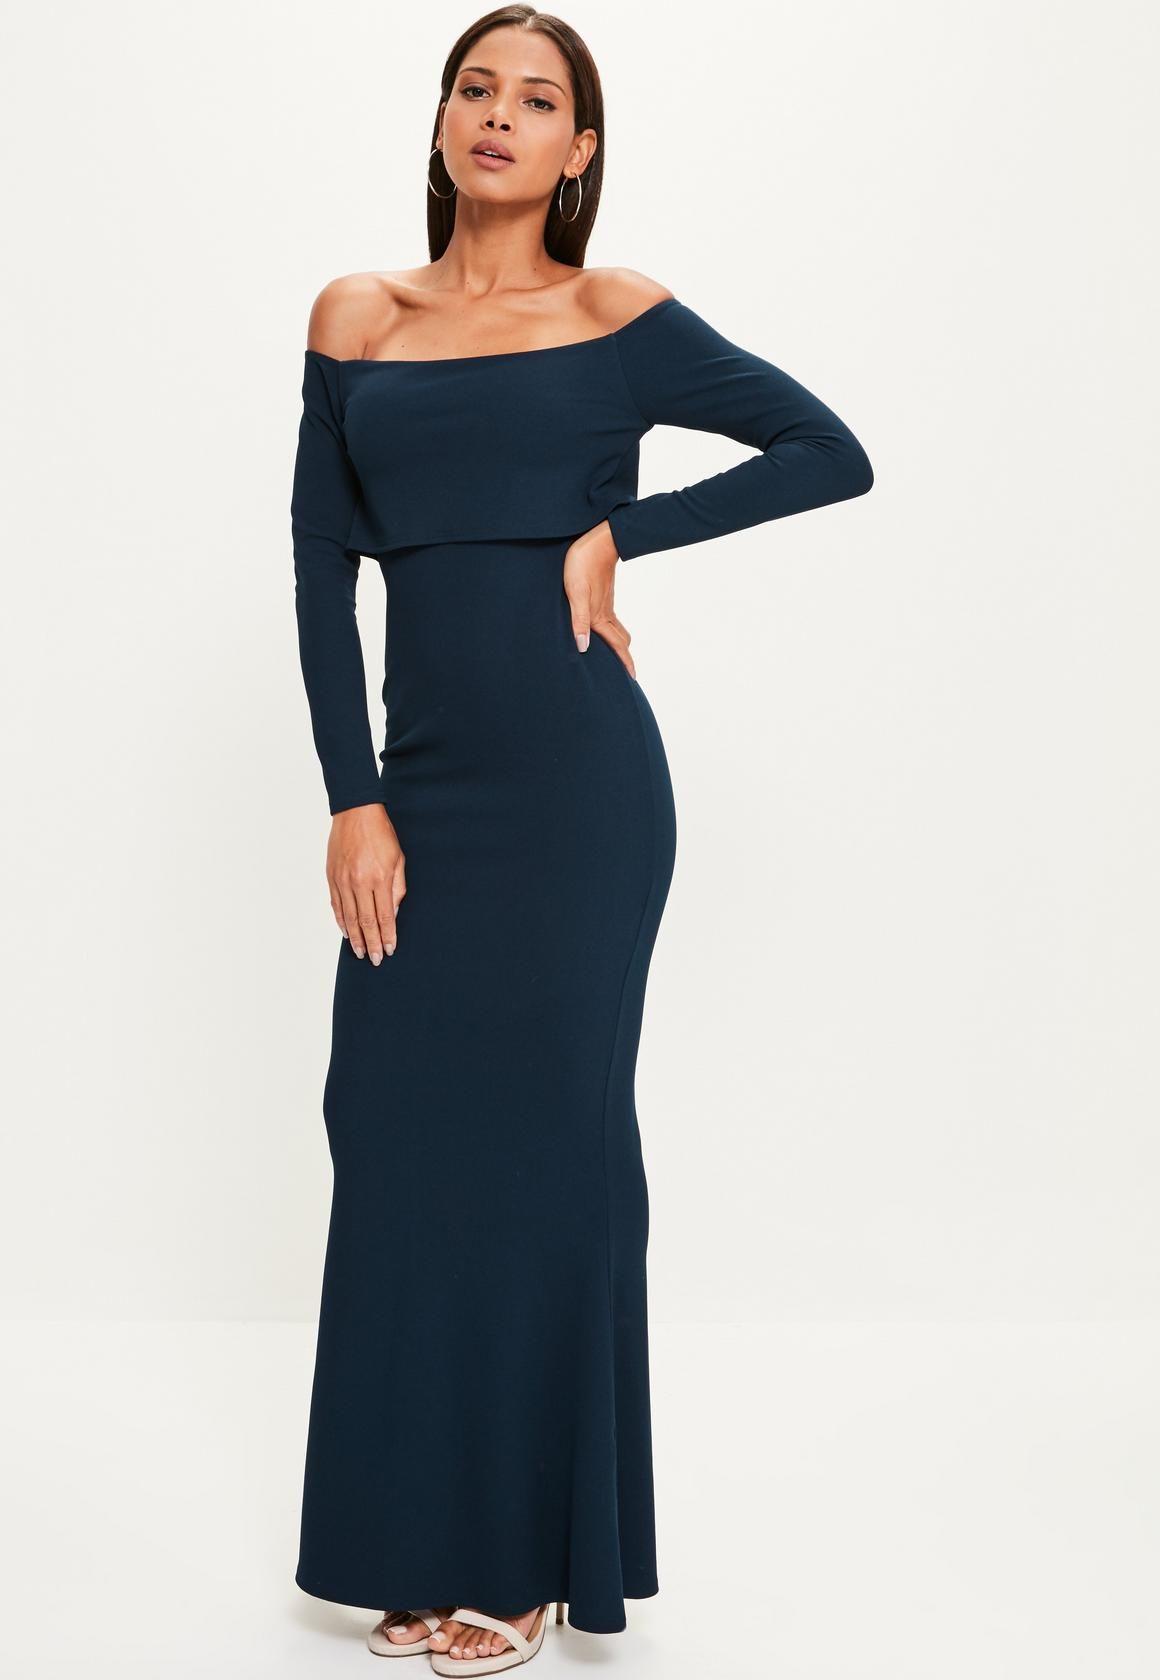 0f1be516a759 Missguided - Navy Crepe Long Sleeve Bardot Maxi Dress